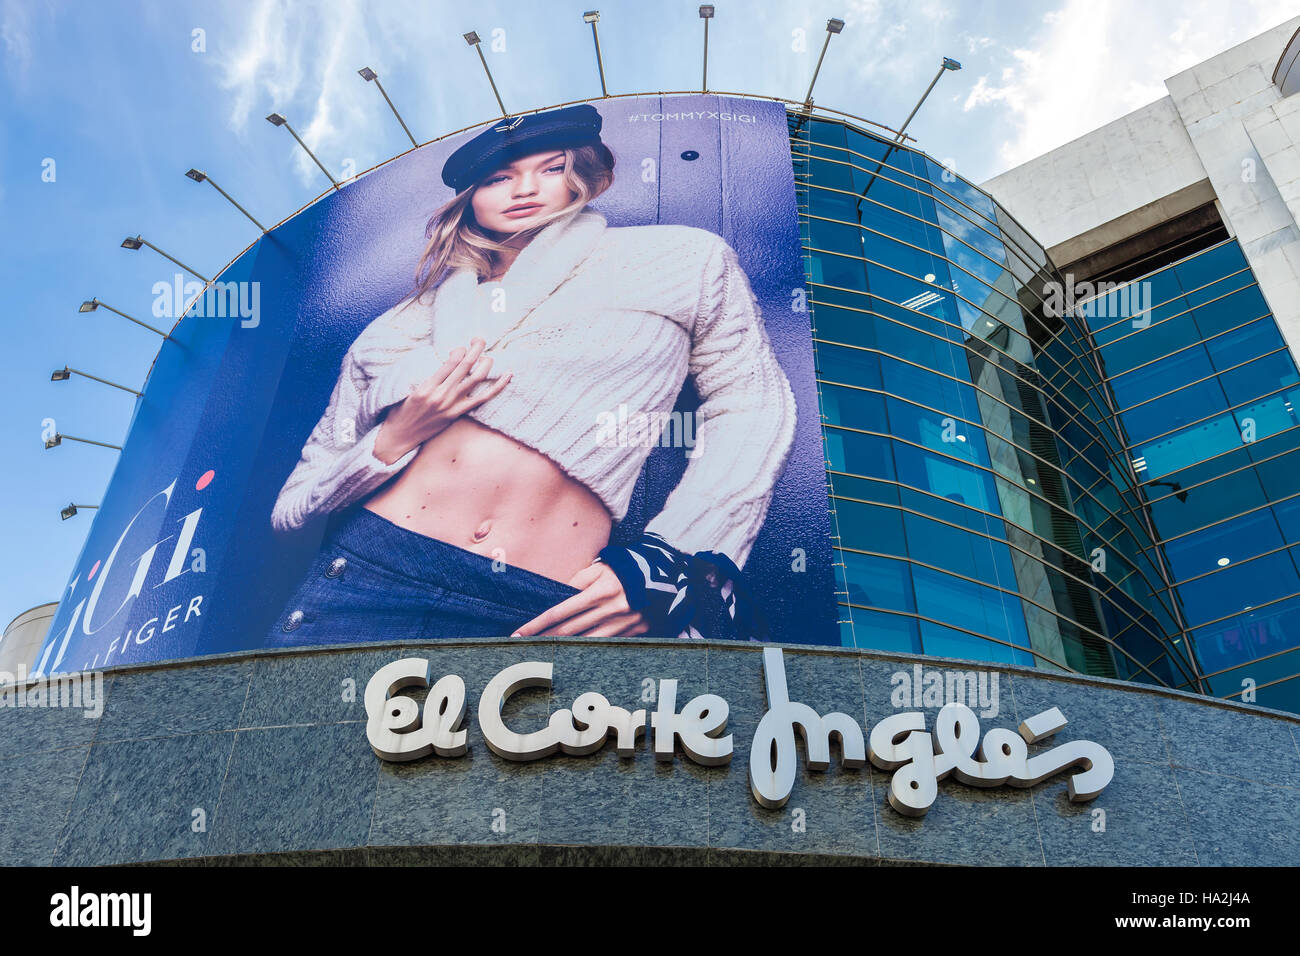 Lissabon, Portugal - 19. Oktober 2016: El Corte Ingles, ein high-End-Shopping-Mall. Plakatwand oder große Anzeige Stockbild